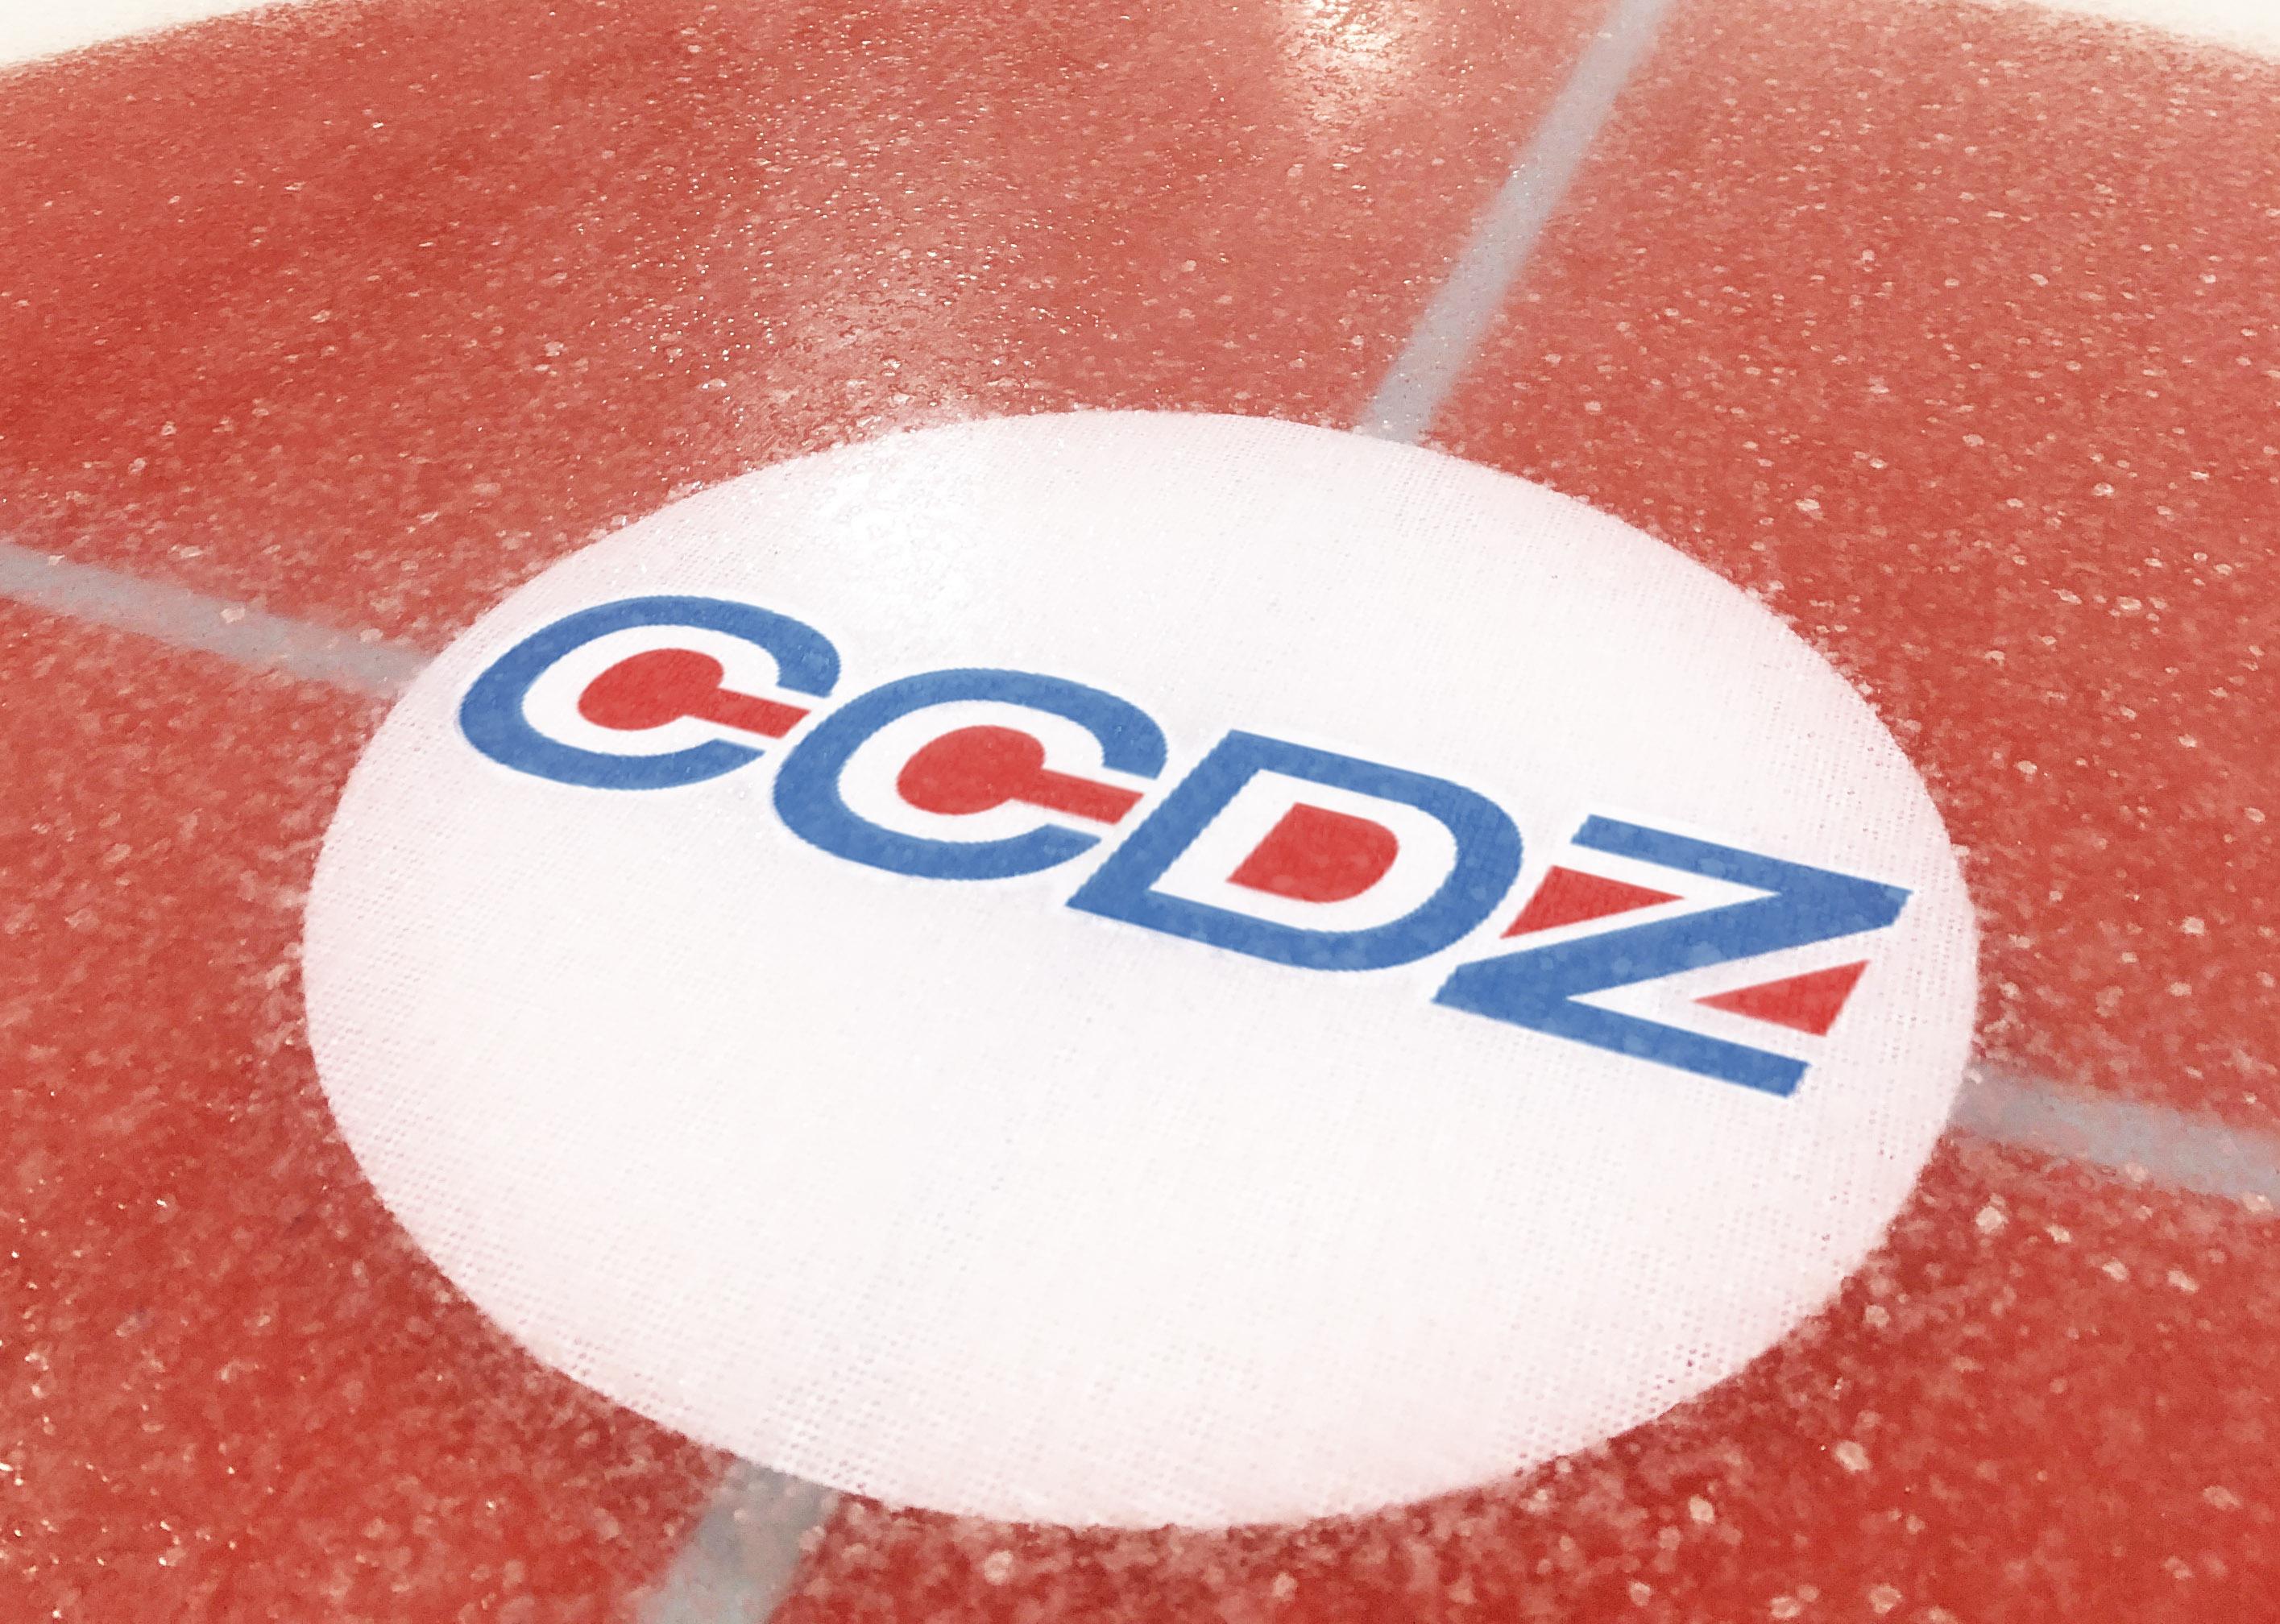 20201612_CCDZ_nur-logo